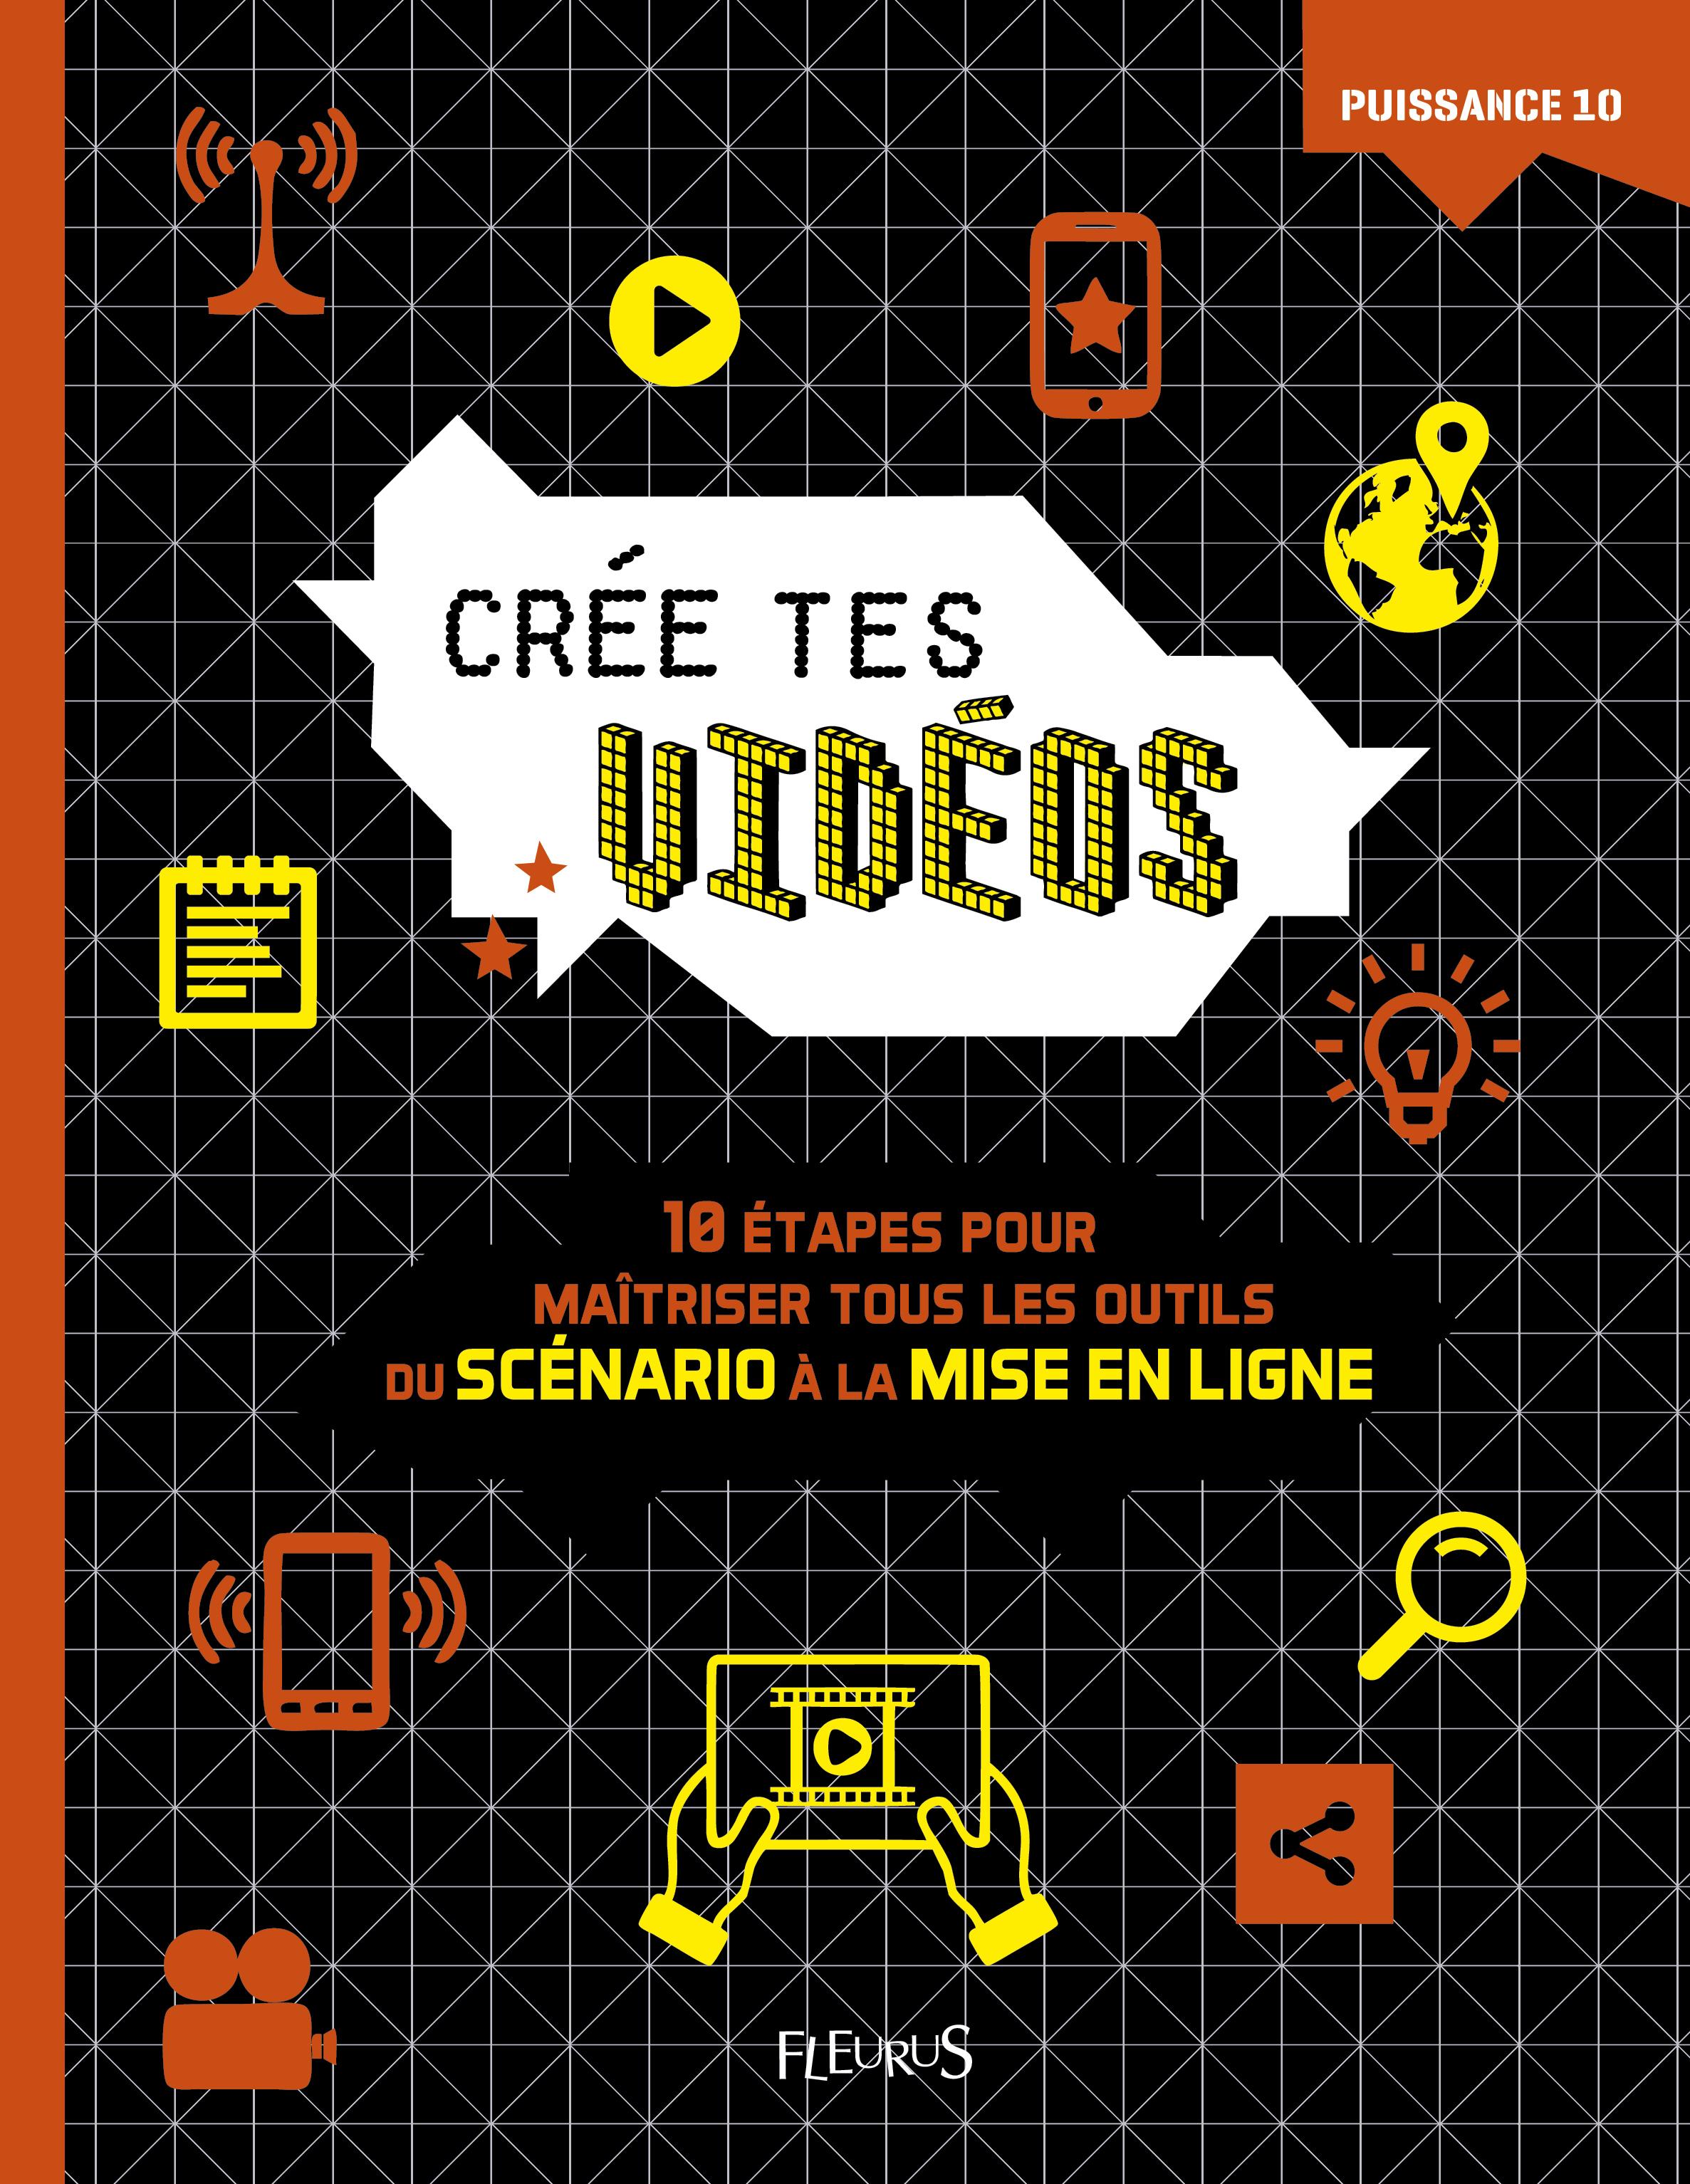 CREE TES VIDEOS